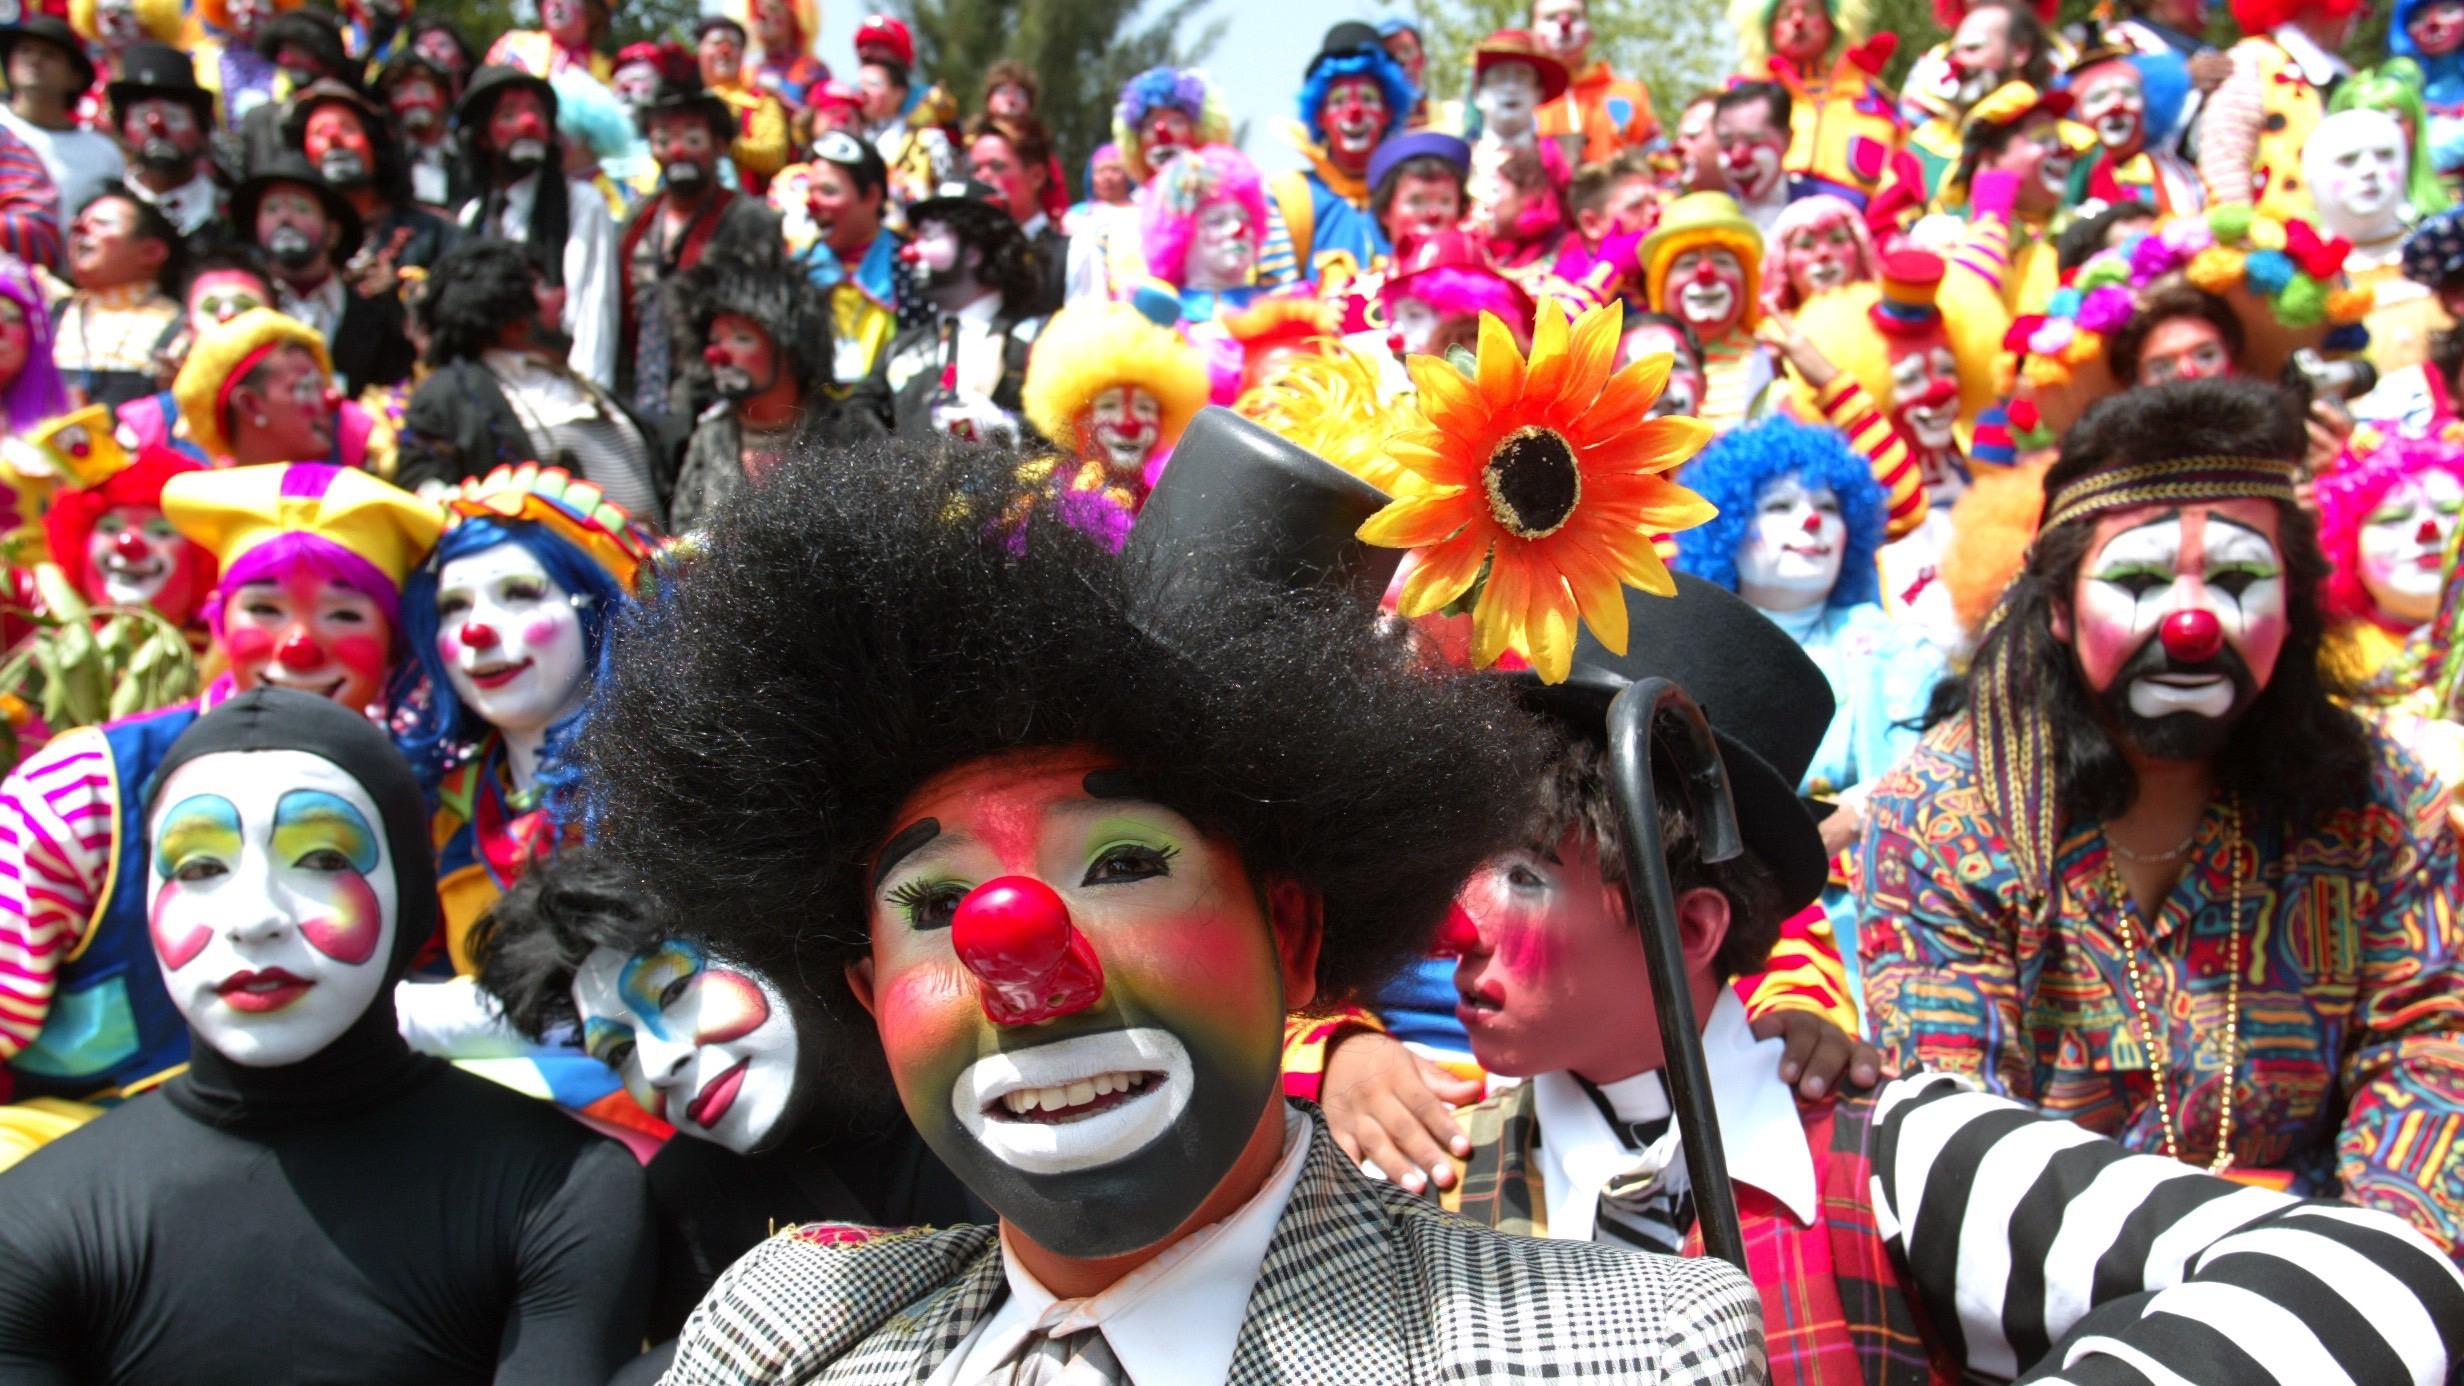 Clowns gather